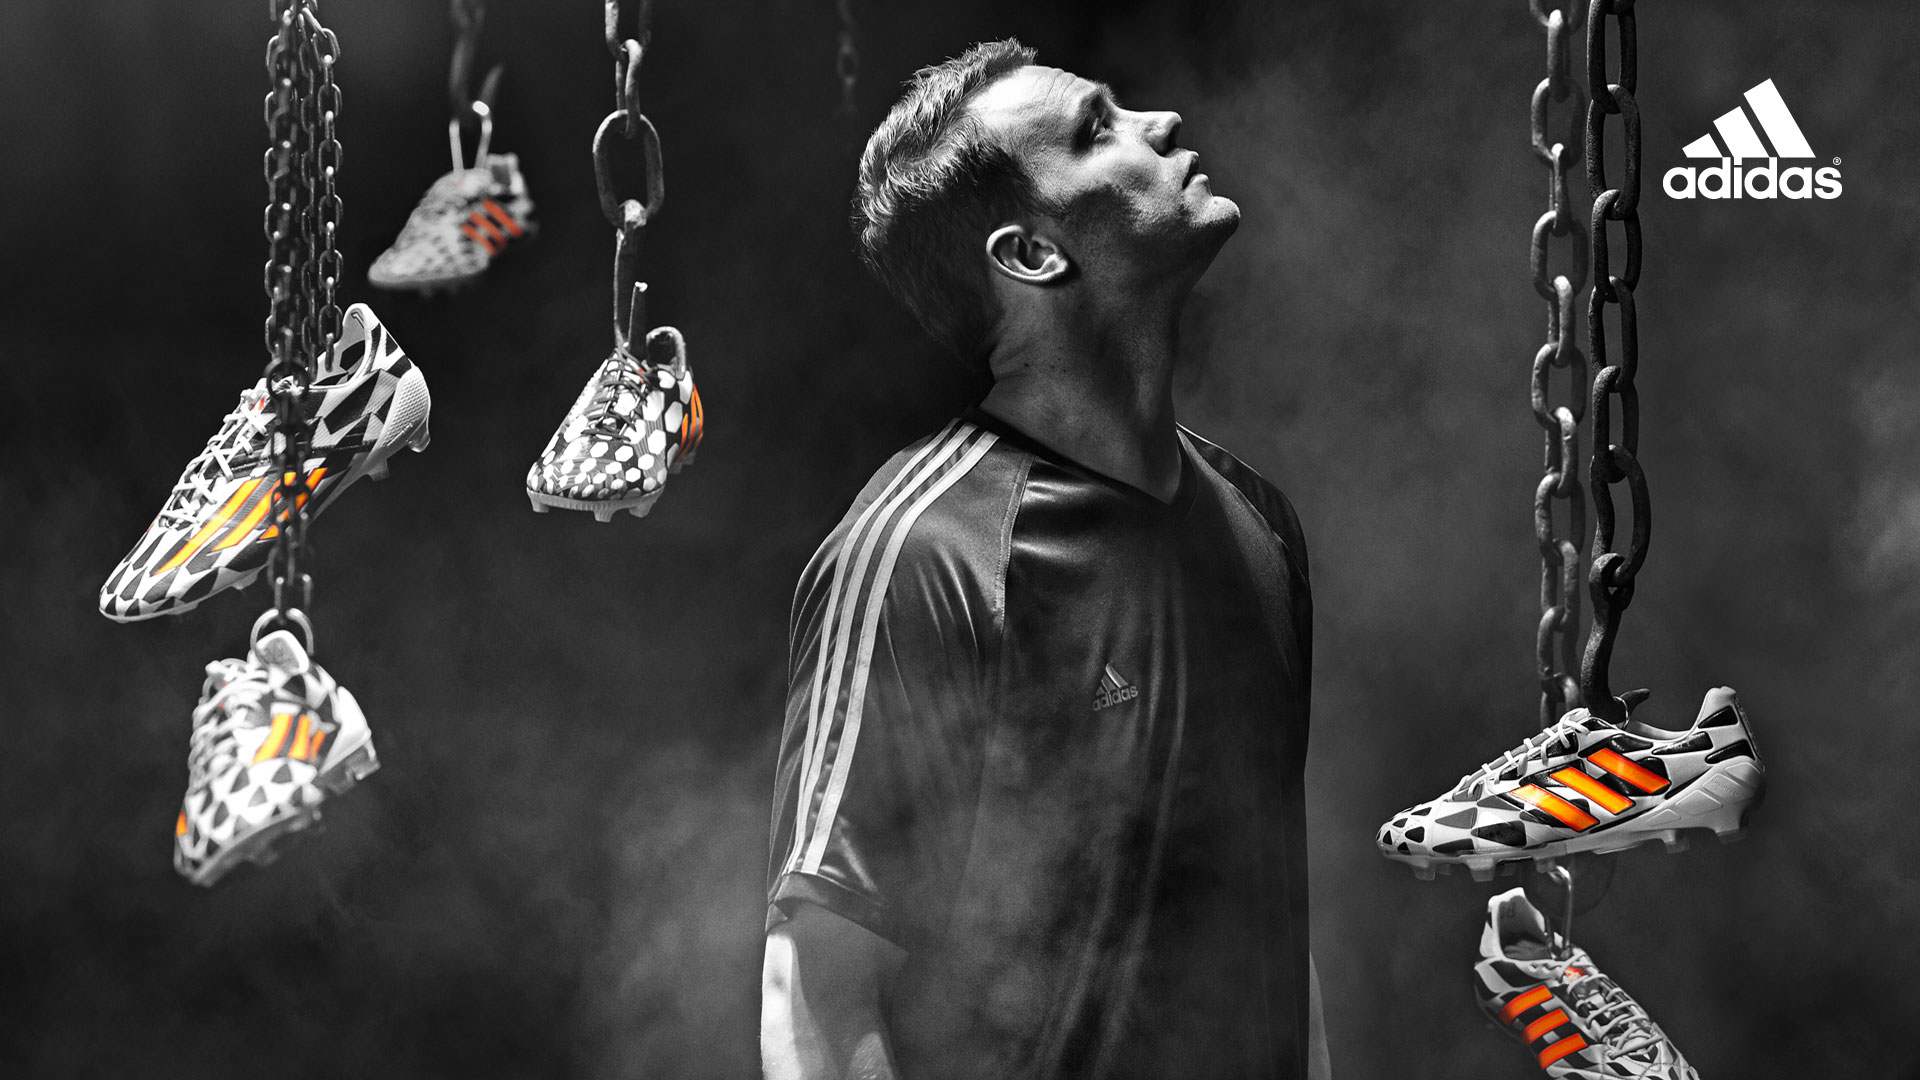 Adidas_Battle_Pack_05